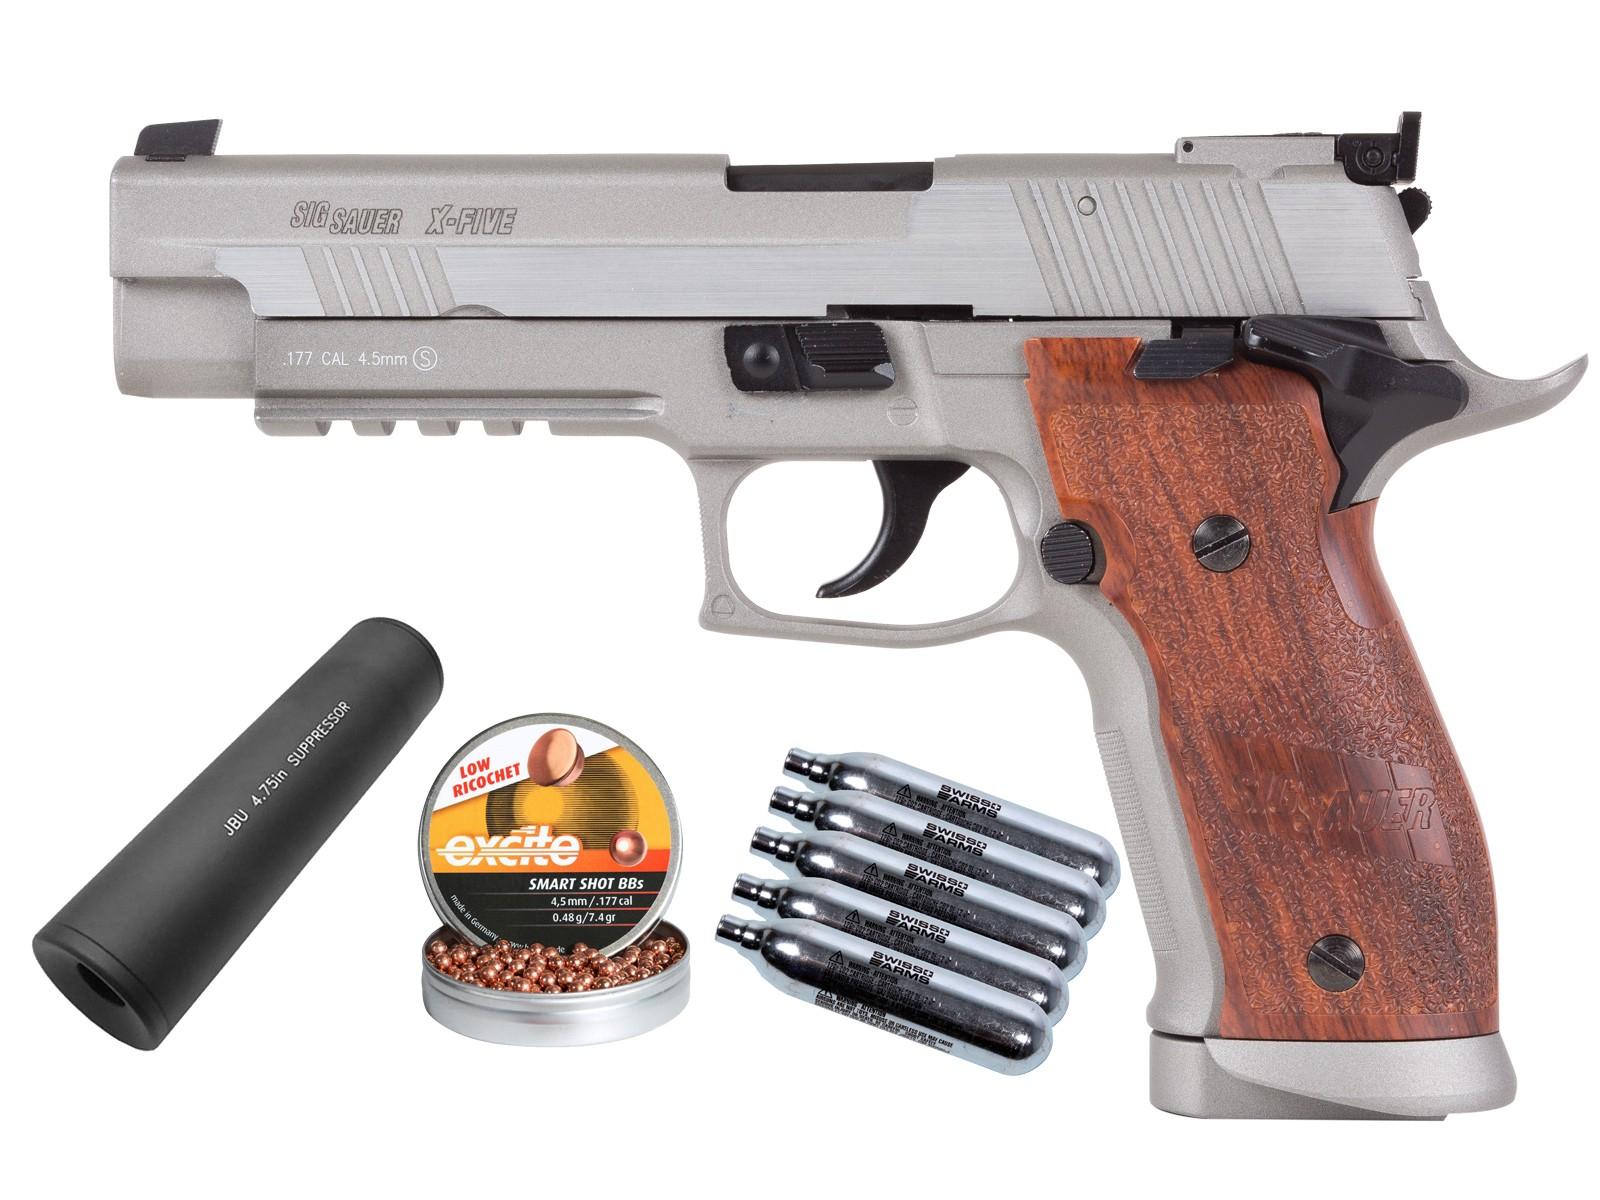 SIG Sauer P226 X-Five .177 CO2 Pistol Kit, Silver/Wood Grips